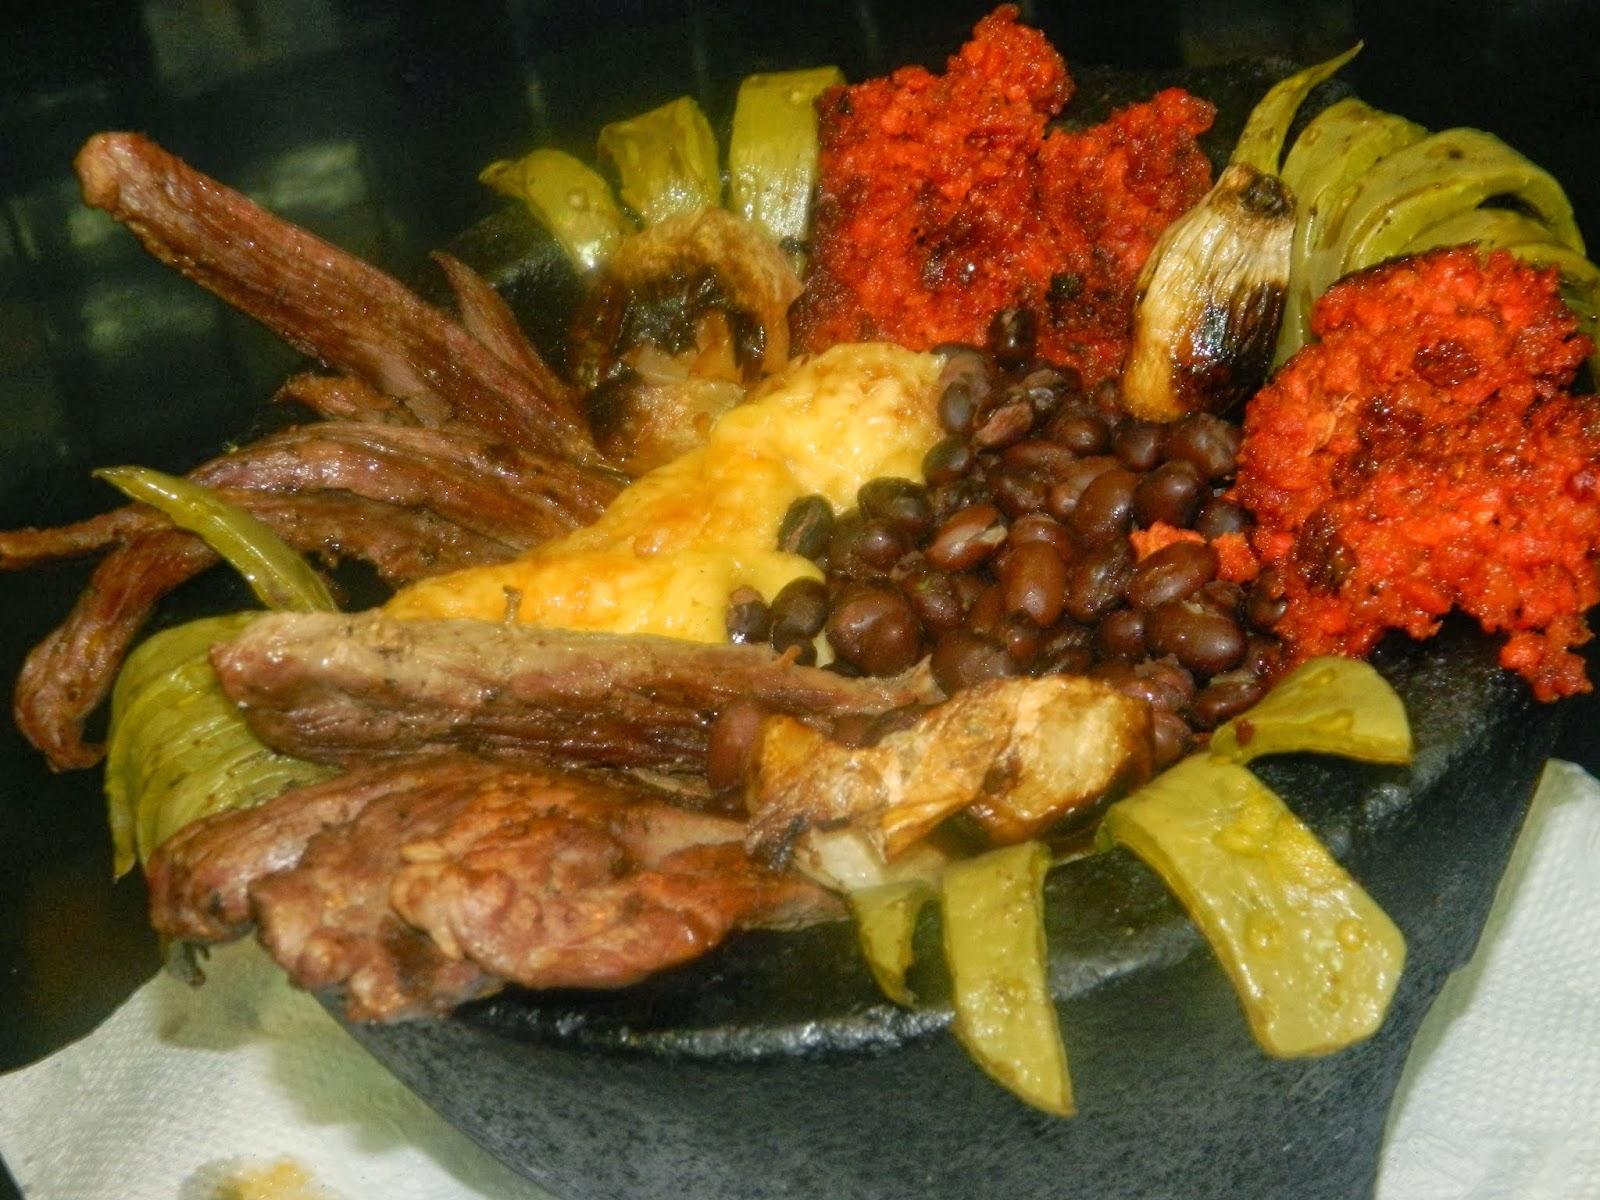 Tepito Restaurants molcajete_-jorullo